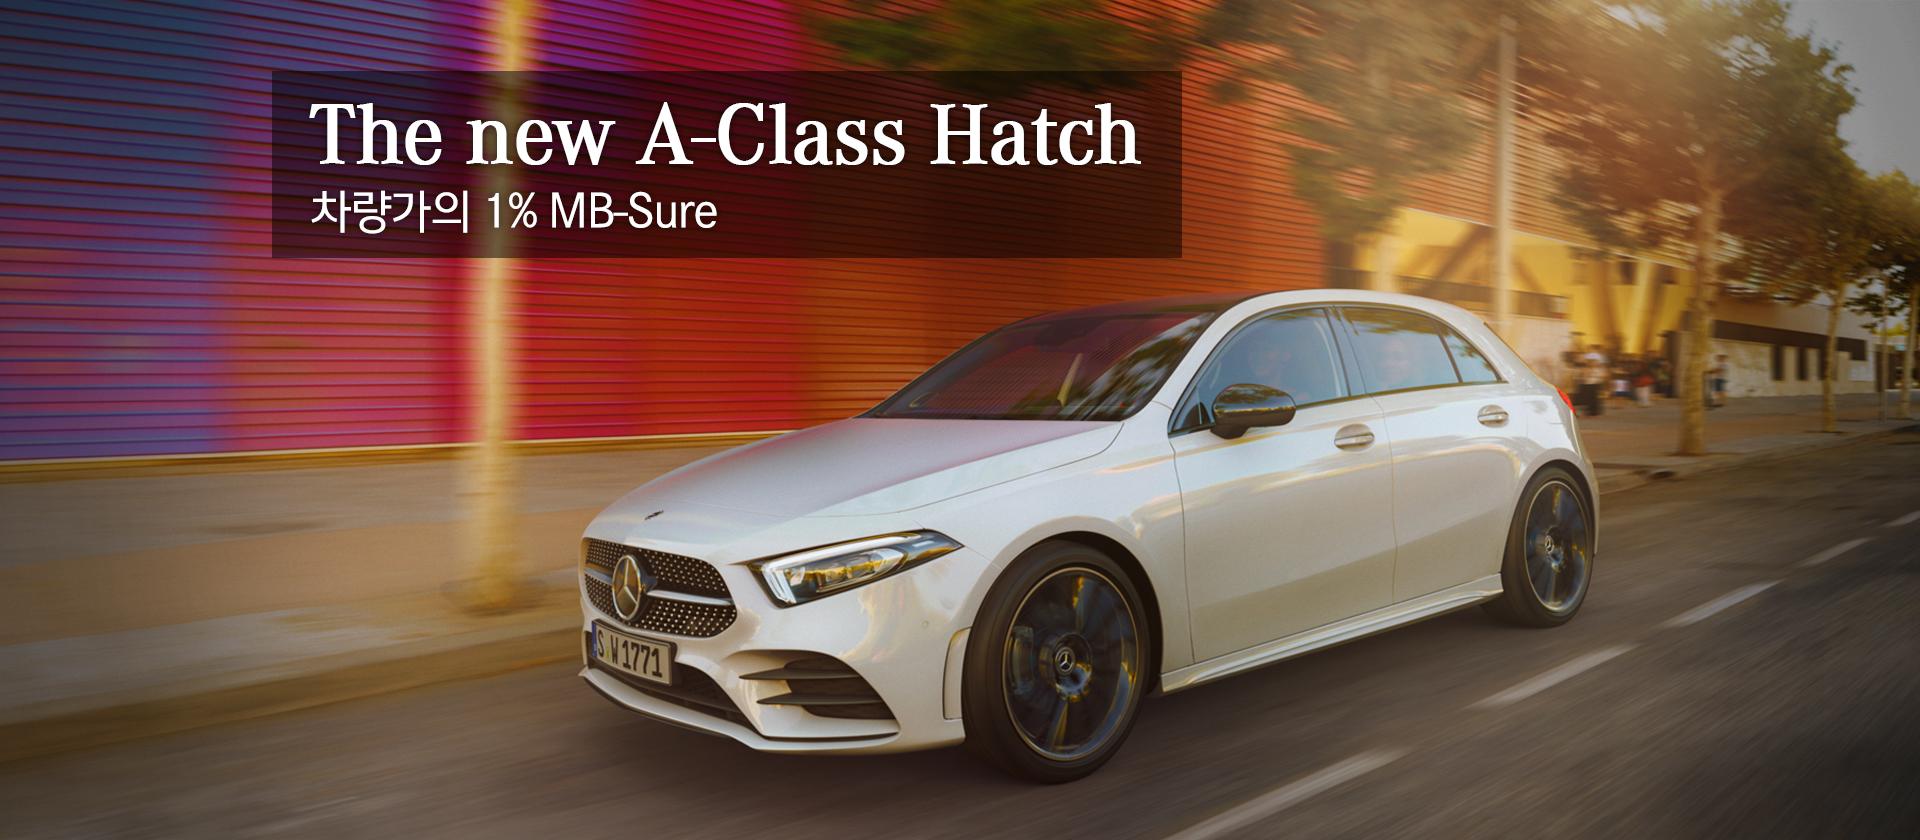 The New A-Class Hatch